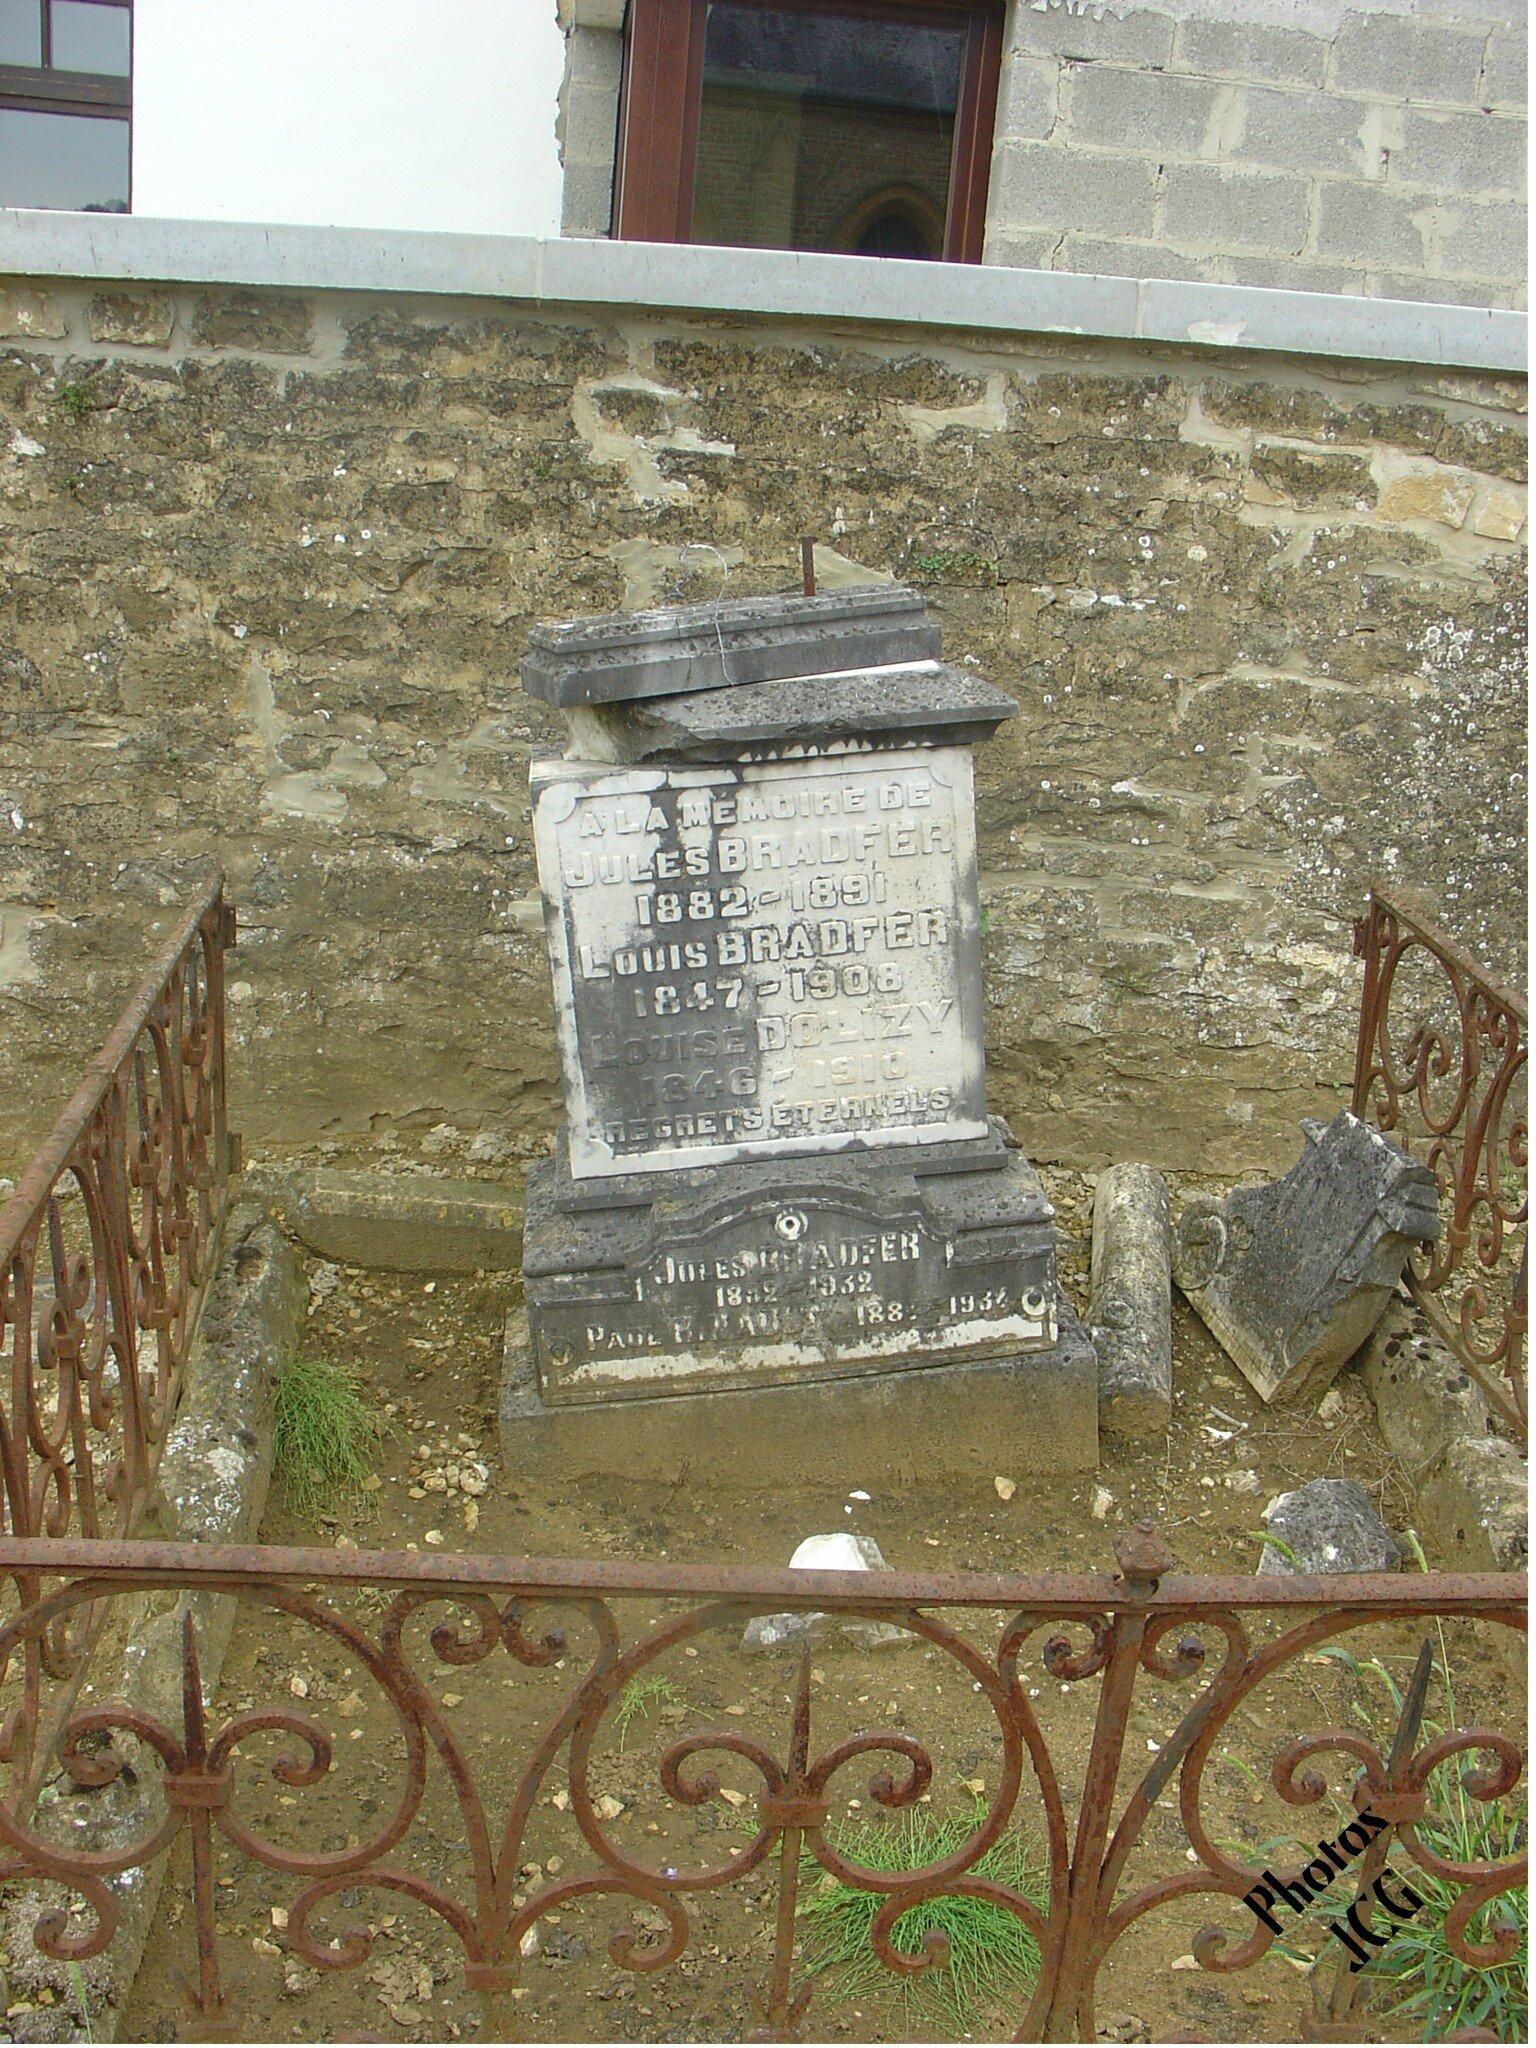 Jules BRADFER 1882-1891 Louis BRADFER 1847-1908 Louise DOLIZY 1846-1910 Jules BRADFER 1882-1932 Paul R